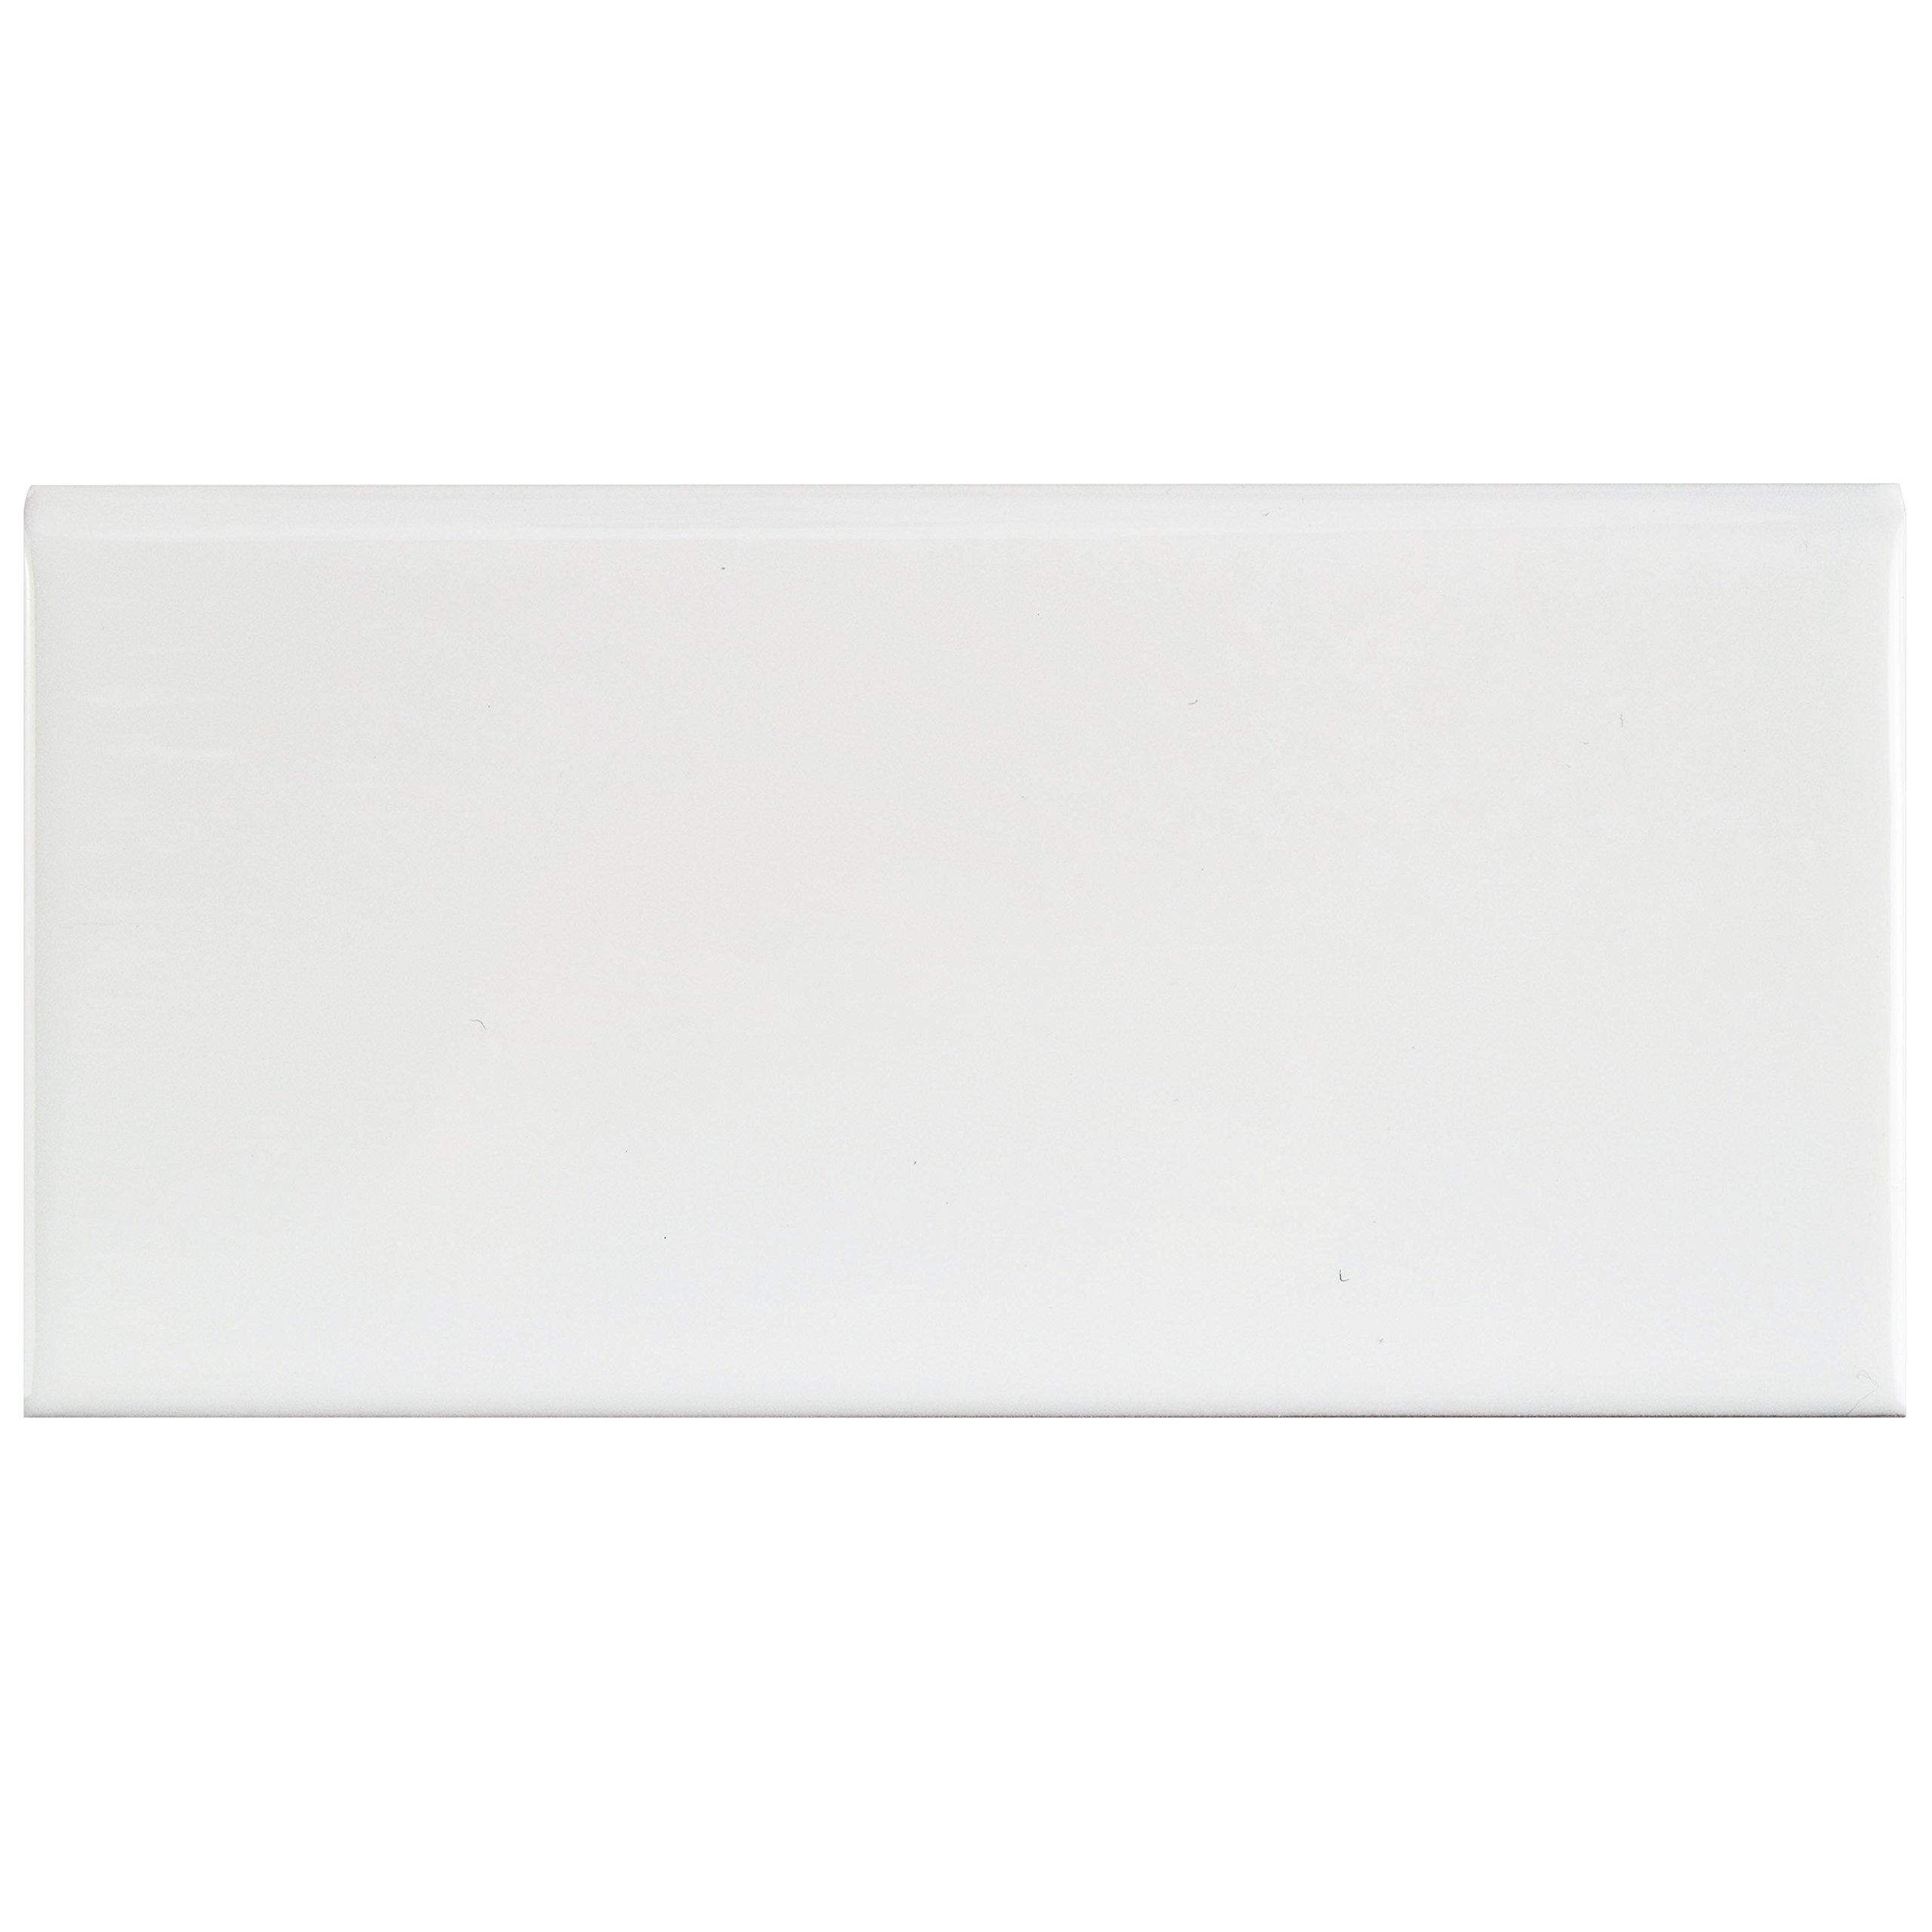 SomerTile WXRPSWBN Pente Subway Bullnose Ceramic Wall Tile, 3'' x 6'', Glossy White by SOMERTILE